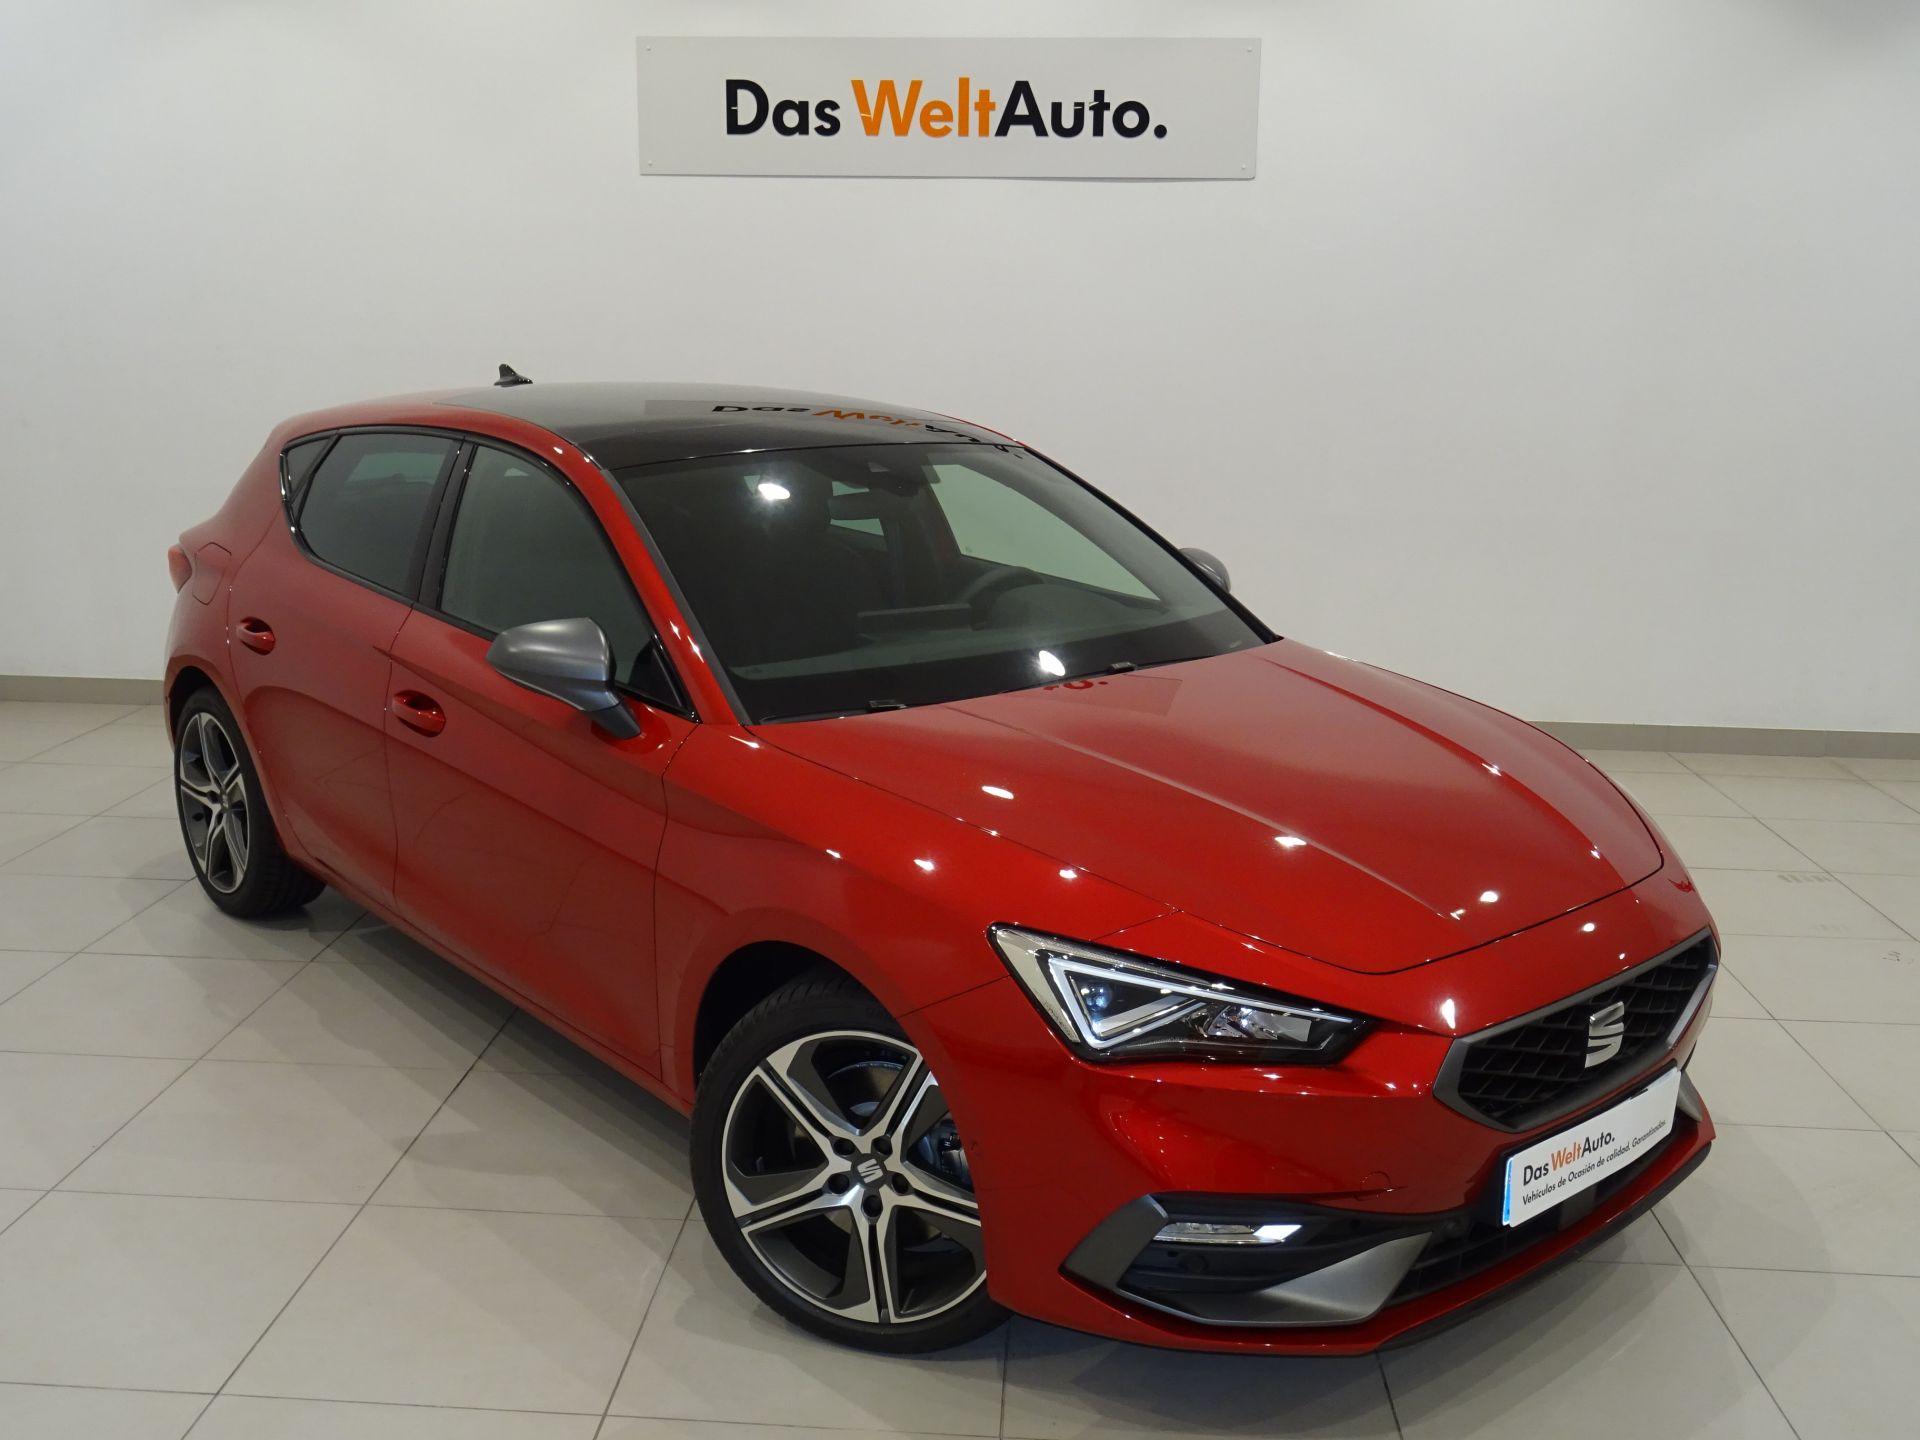 SEAT Nuevo León 1.5 eTSI 110kW DSG-7 S&S FR Go L